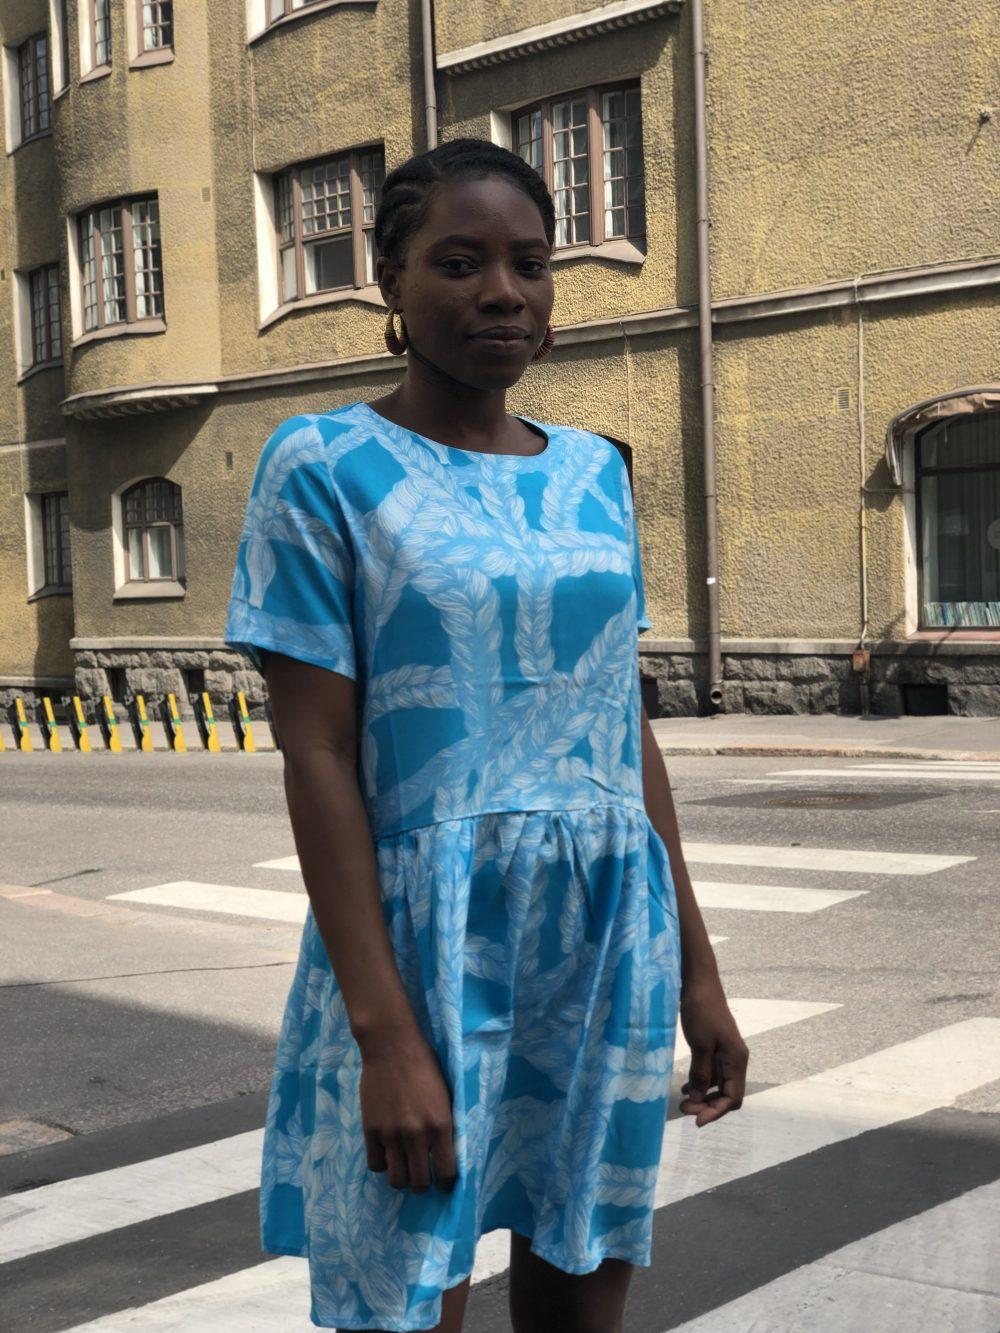 Vimma t-shirt LIU Ruudukko blue 80-140cm - 80-140cm, blue, LIU, Ruudukko, t-shirt